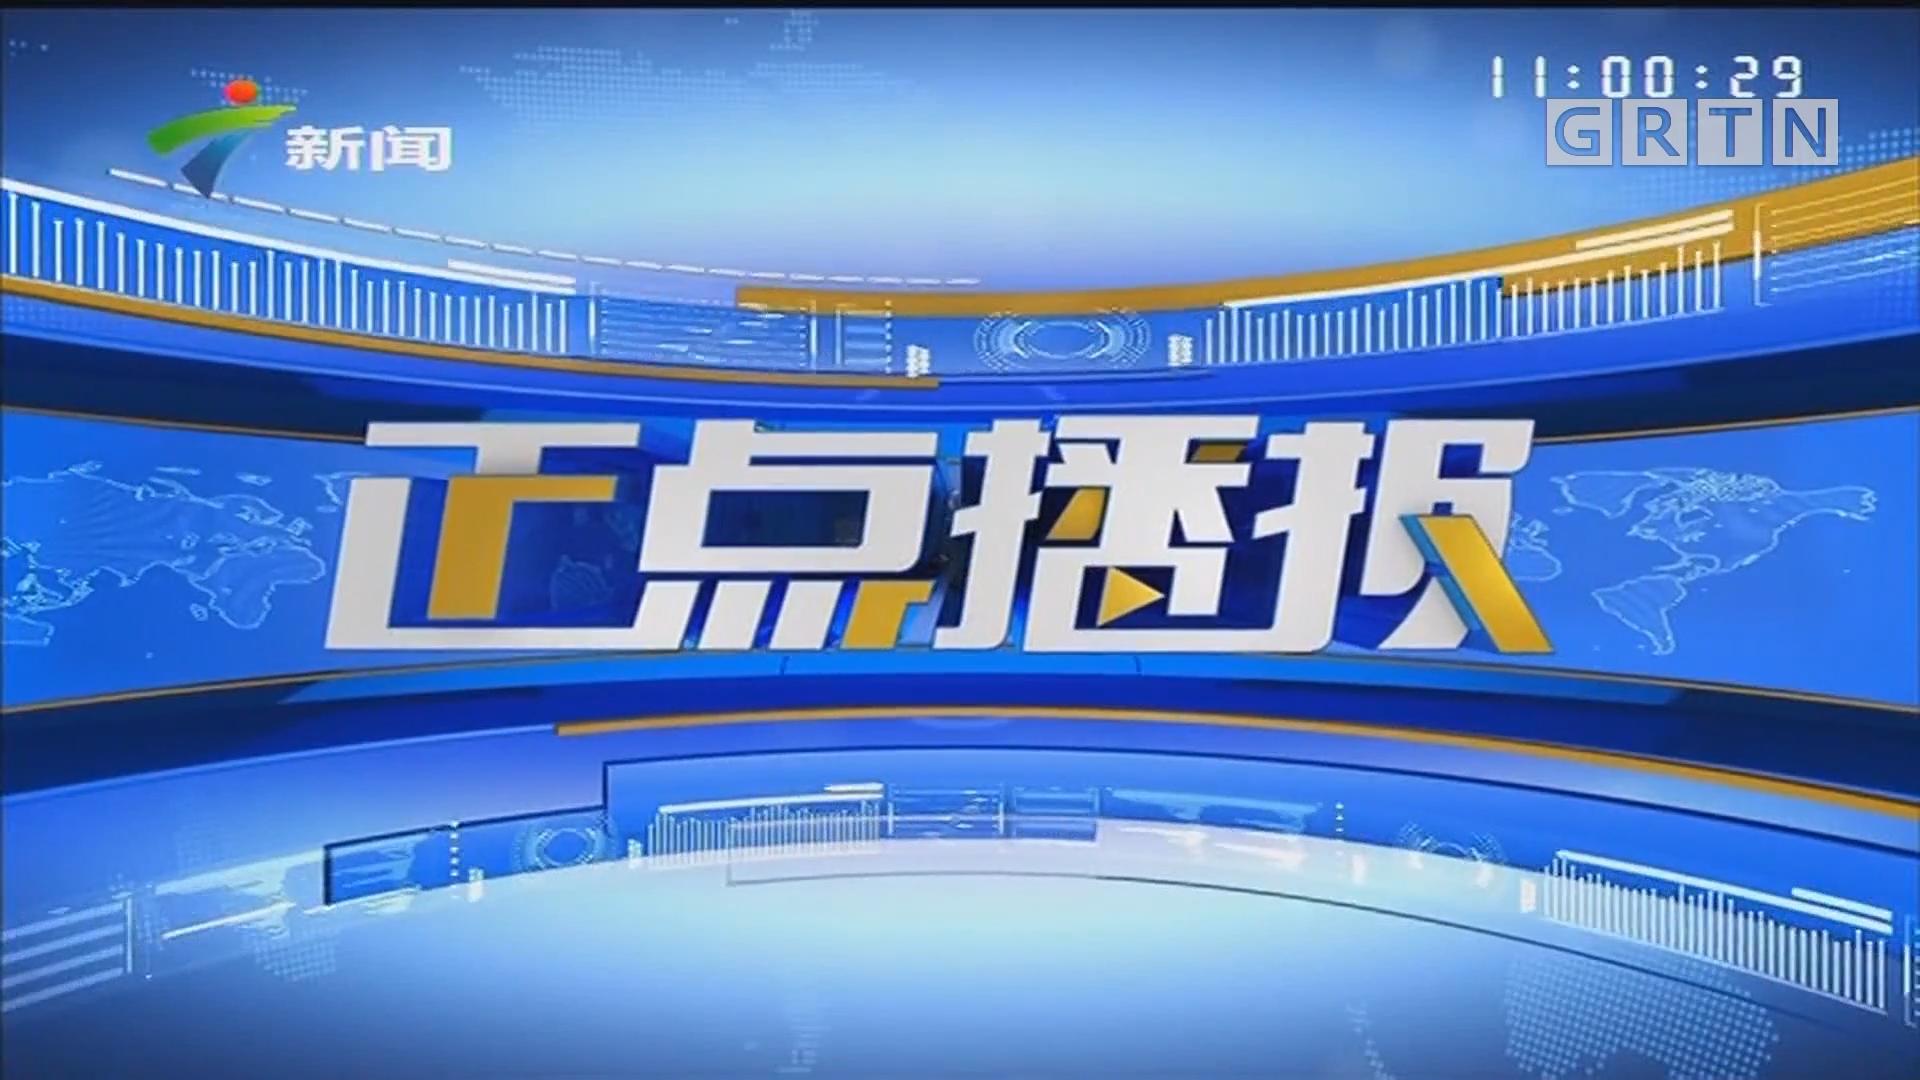 [HD][2019-10-04]正点播报:国庆假期出行提示·公路:全国公路网昨天运行总体平稳有序